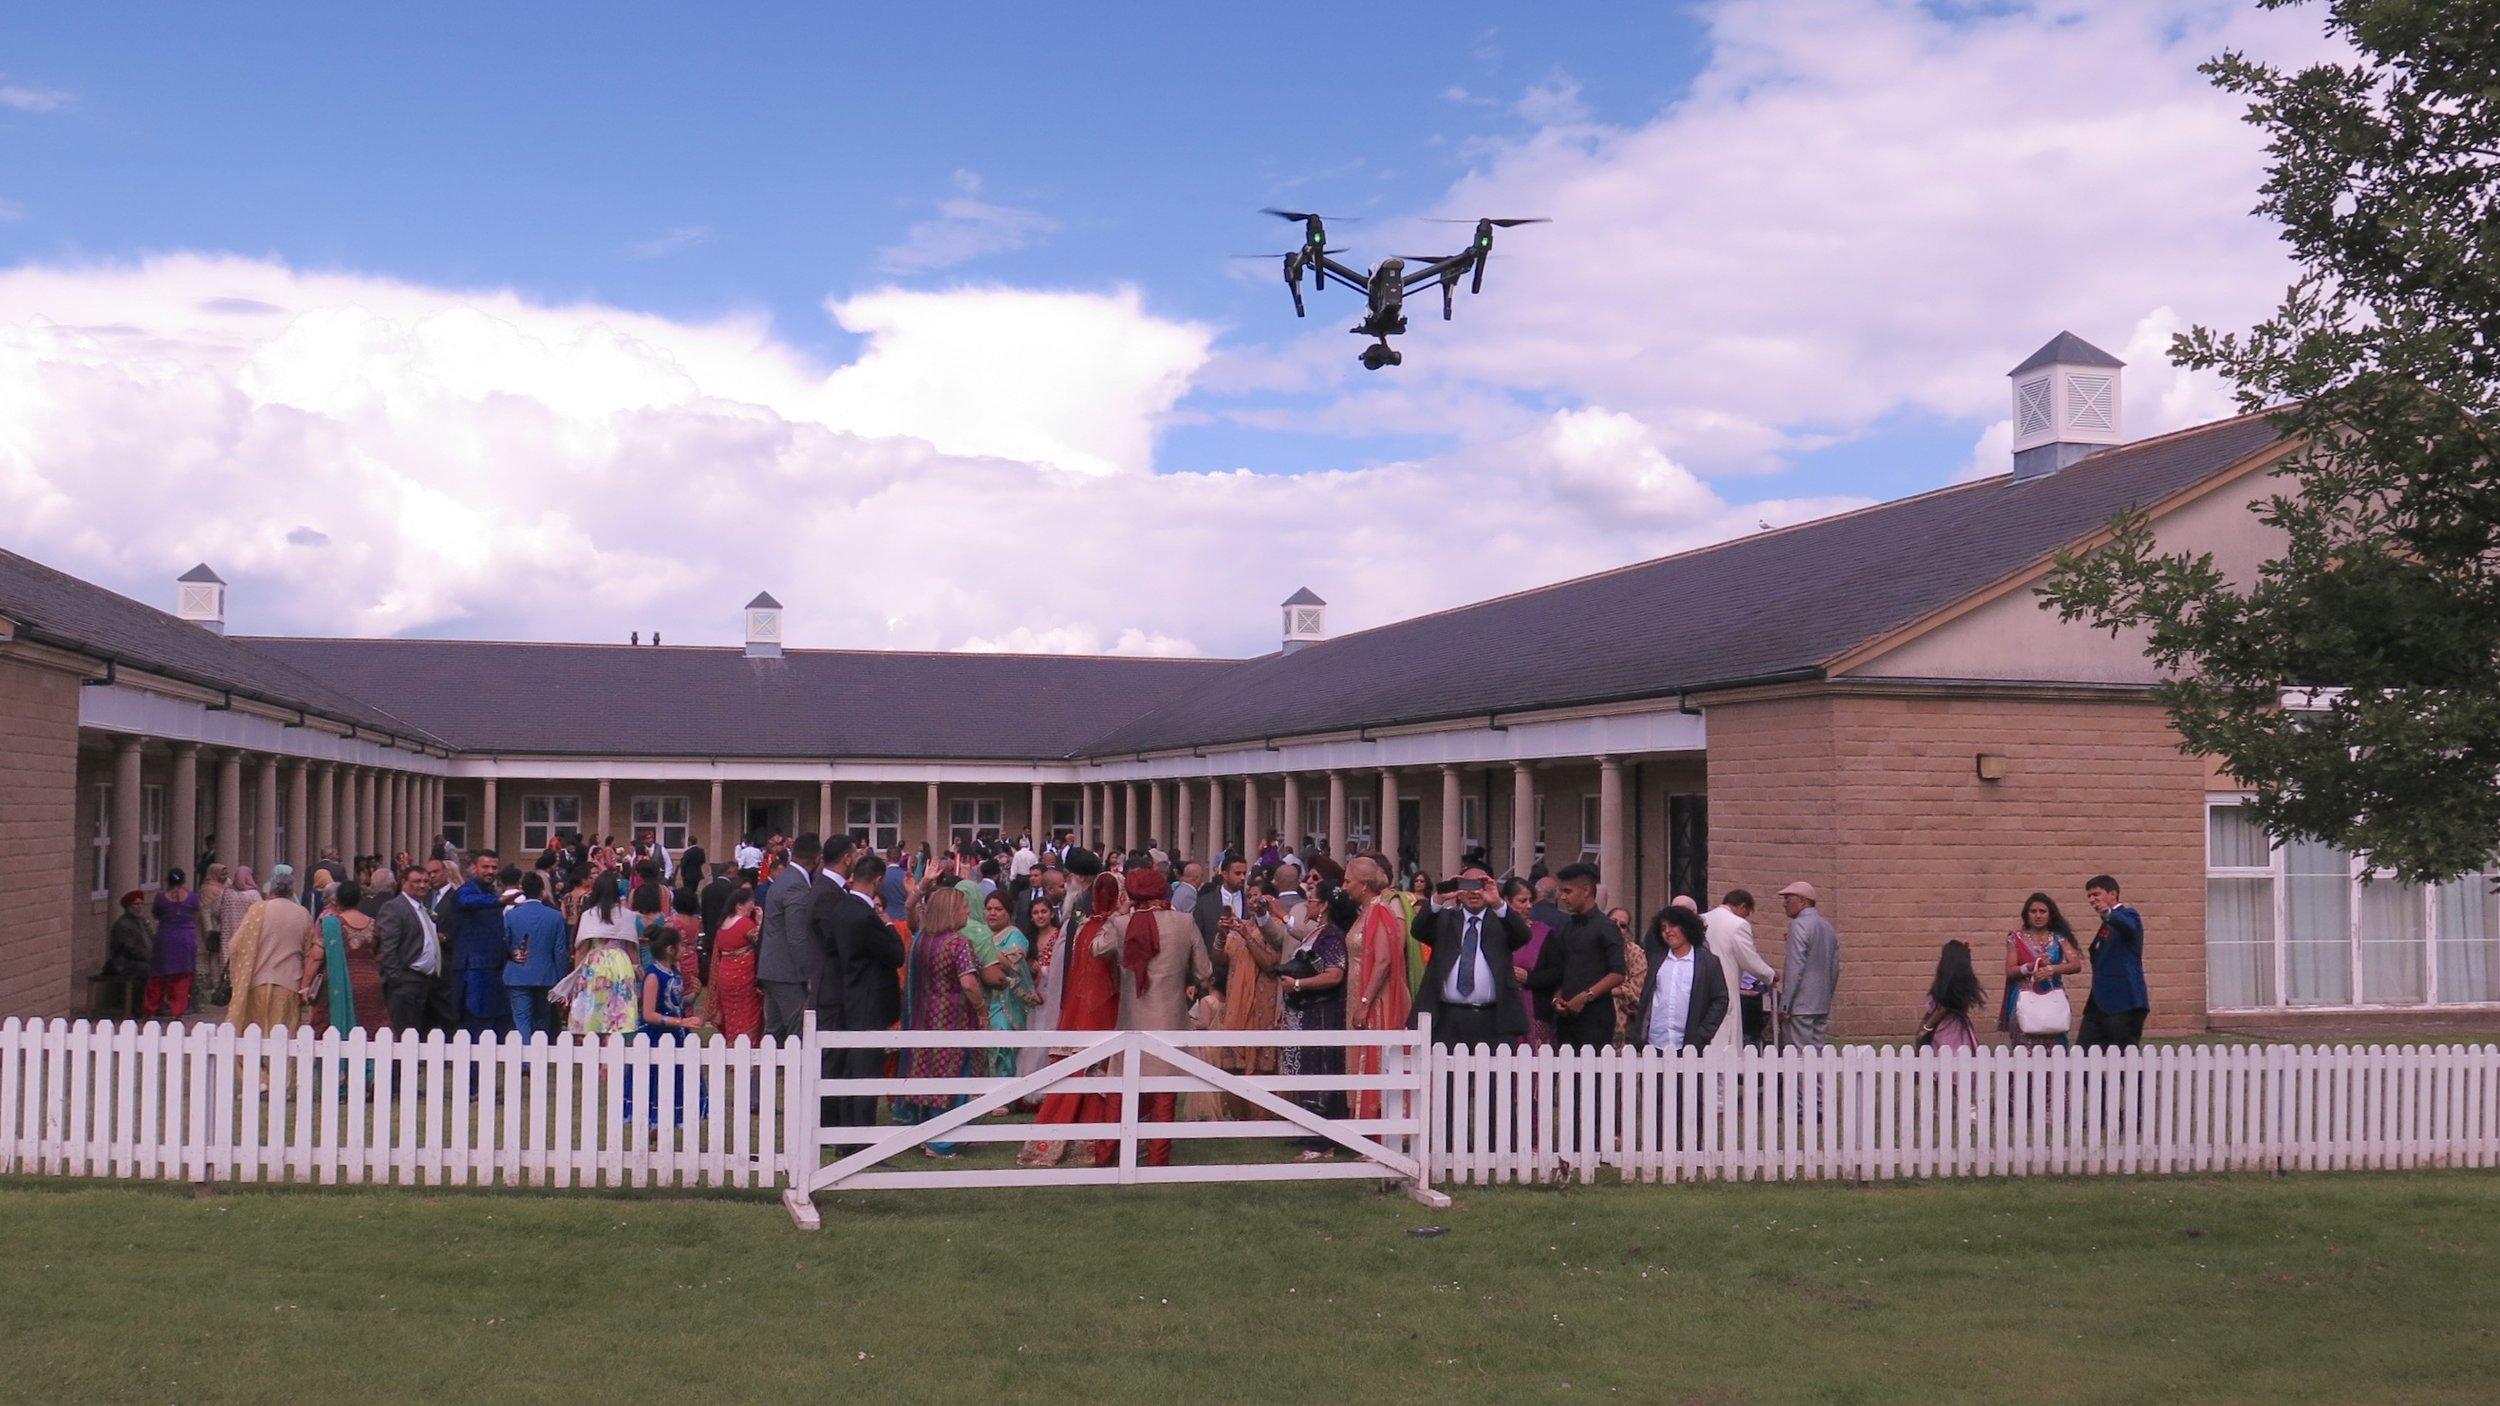 Drone filming for an Asian Wedding in Harrogate